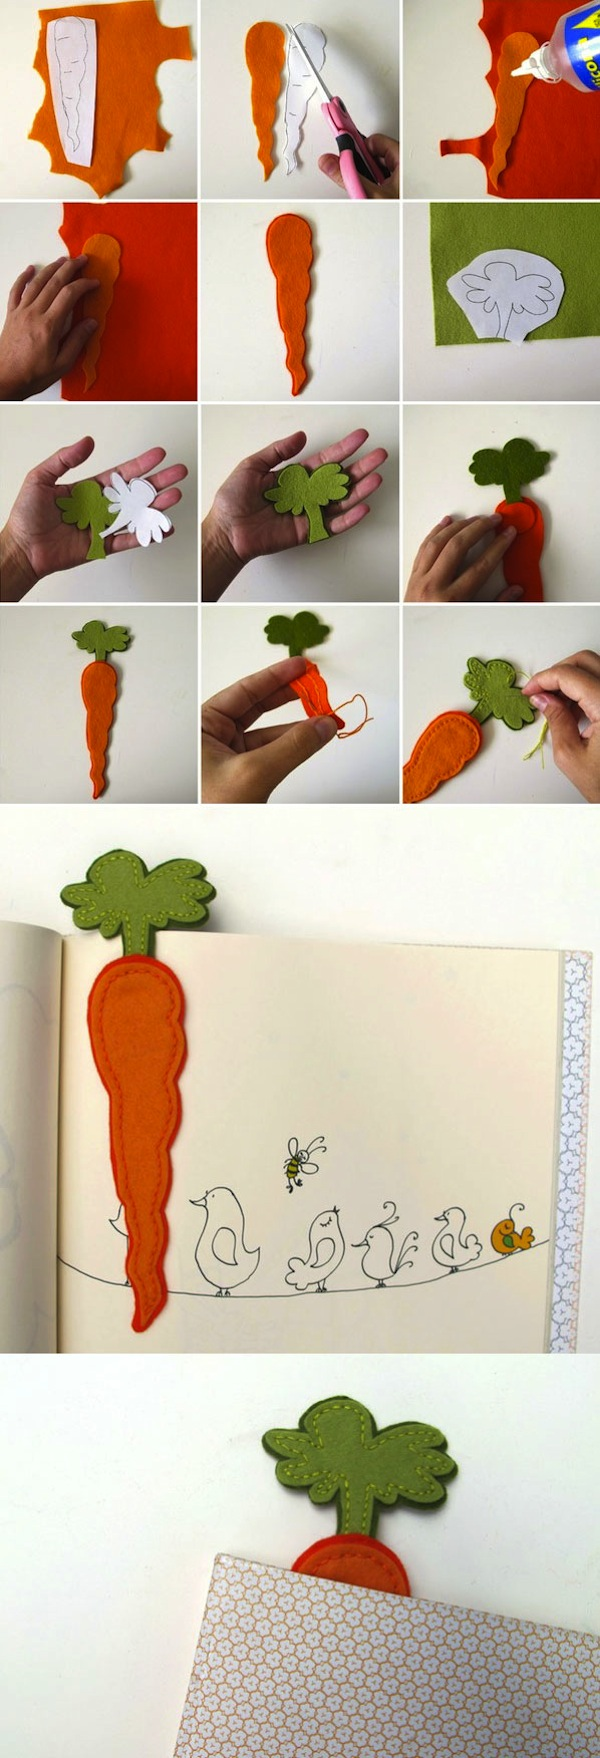 carrotbookmarkstepbystep